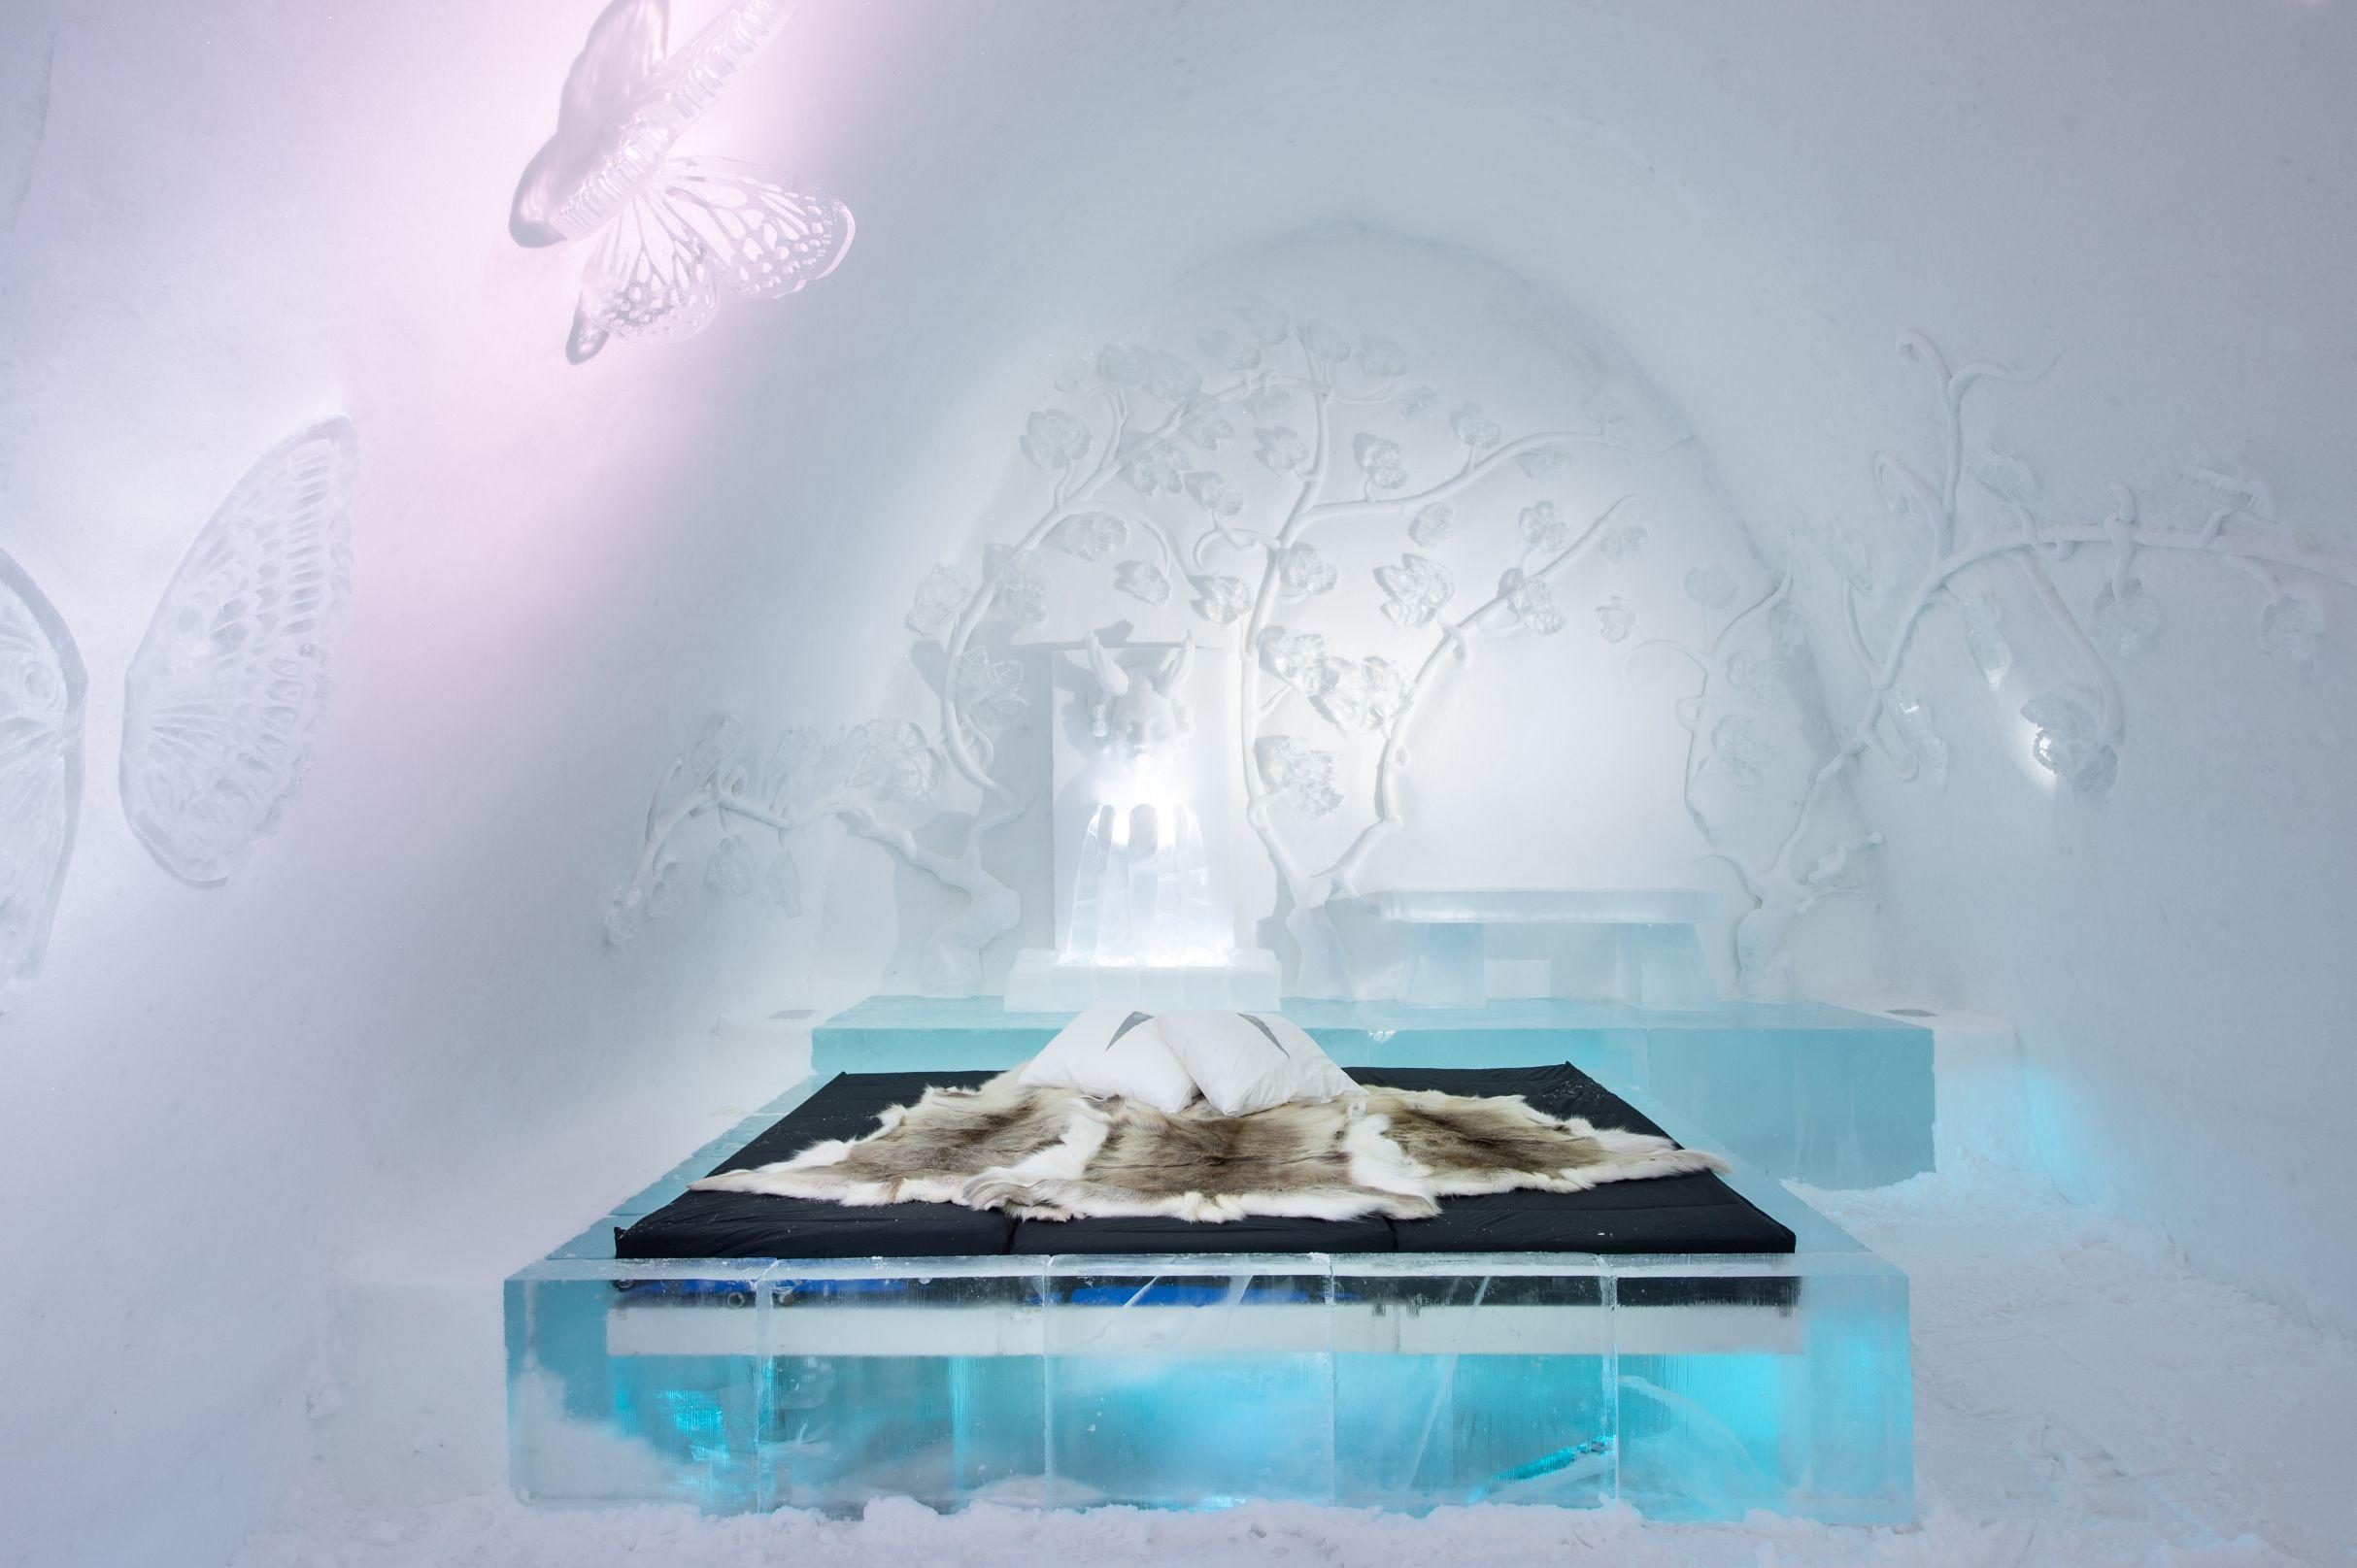 Sweden Opens Its 31st Annual Icehotel—Take a Peek Inside